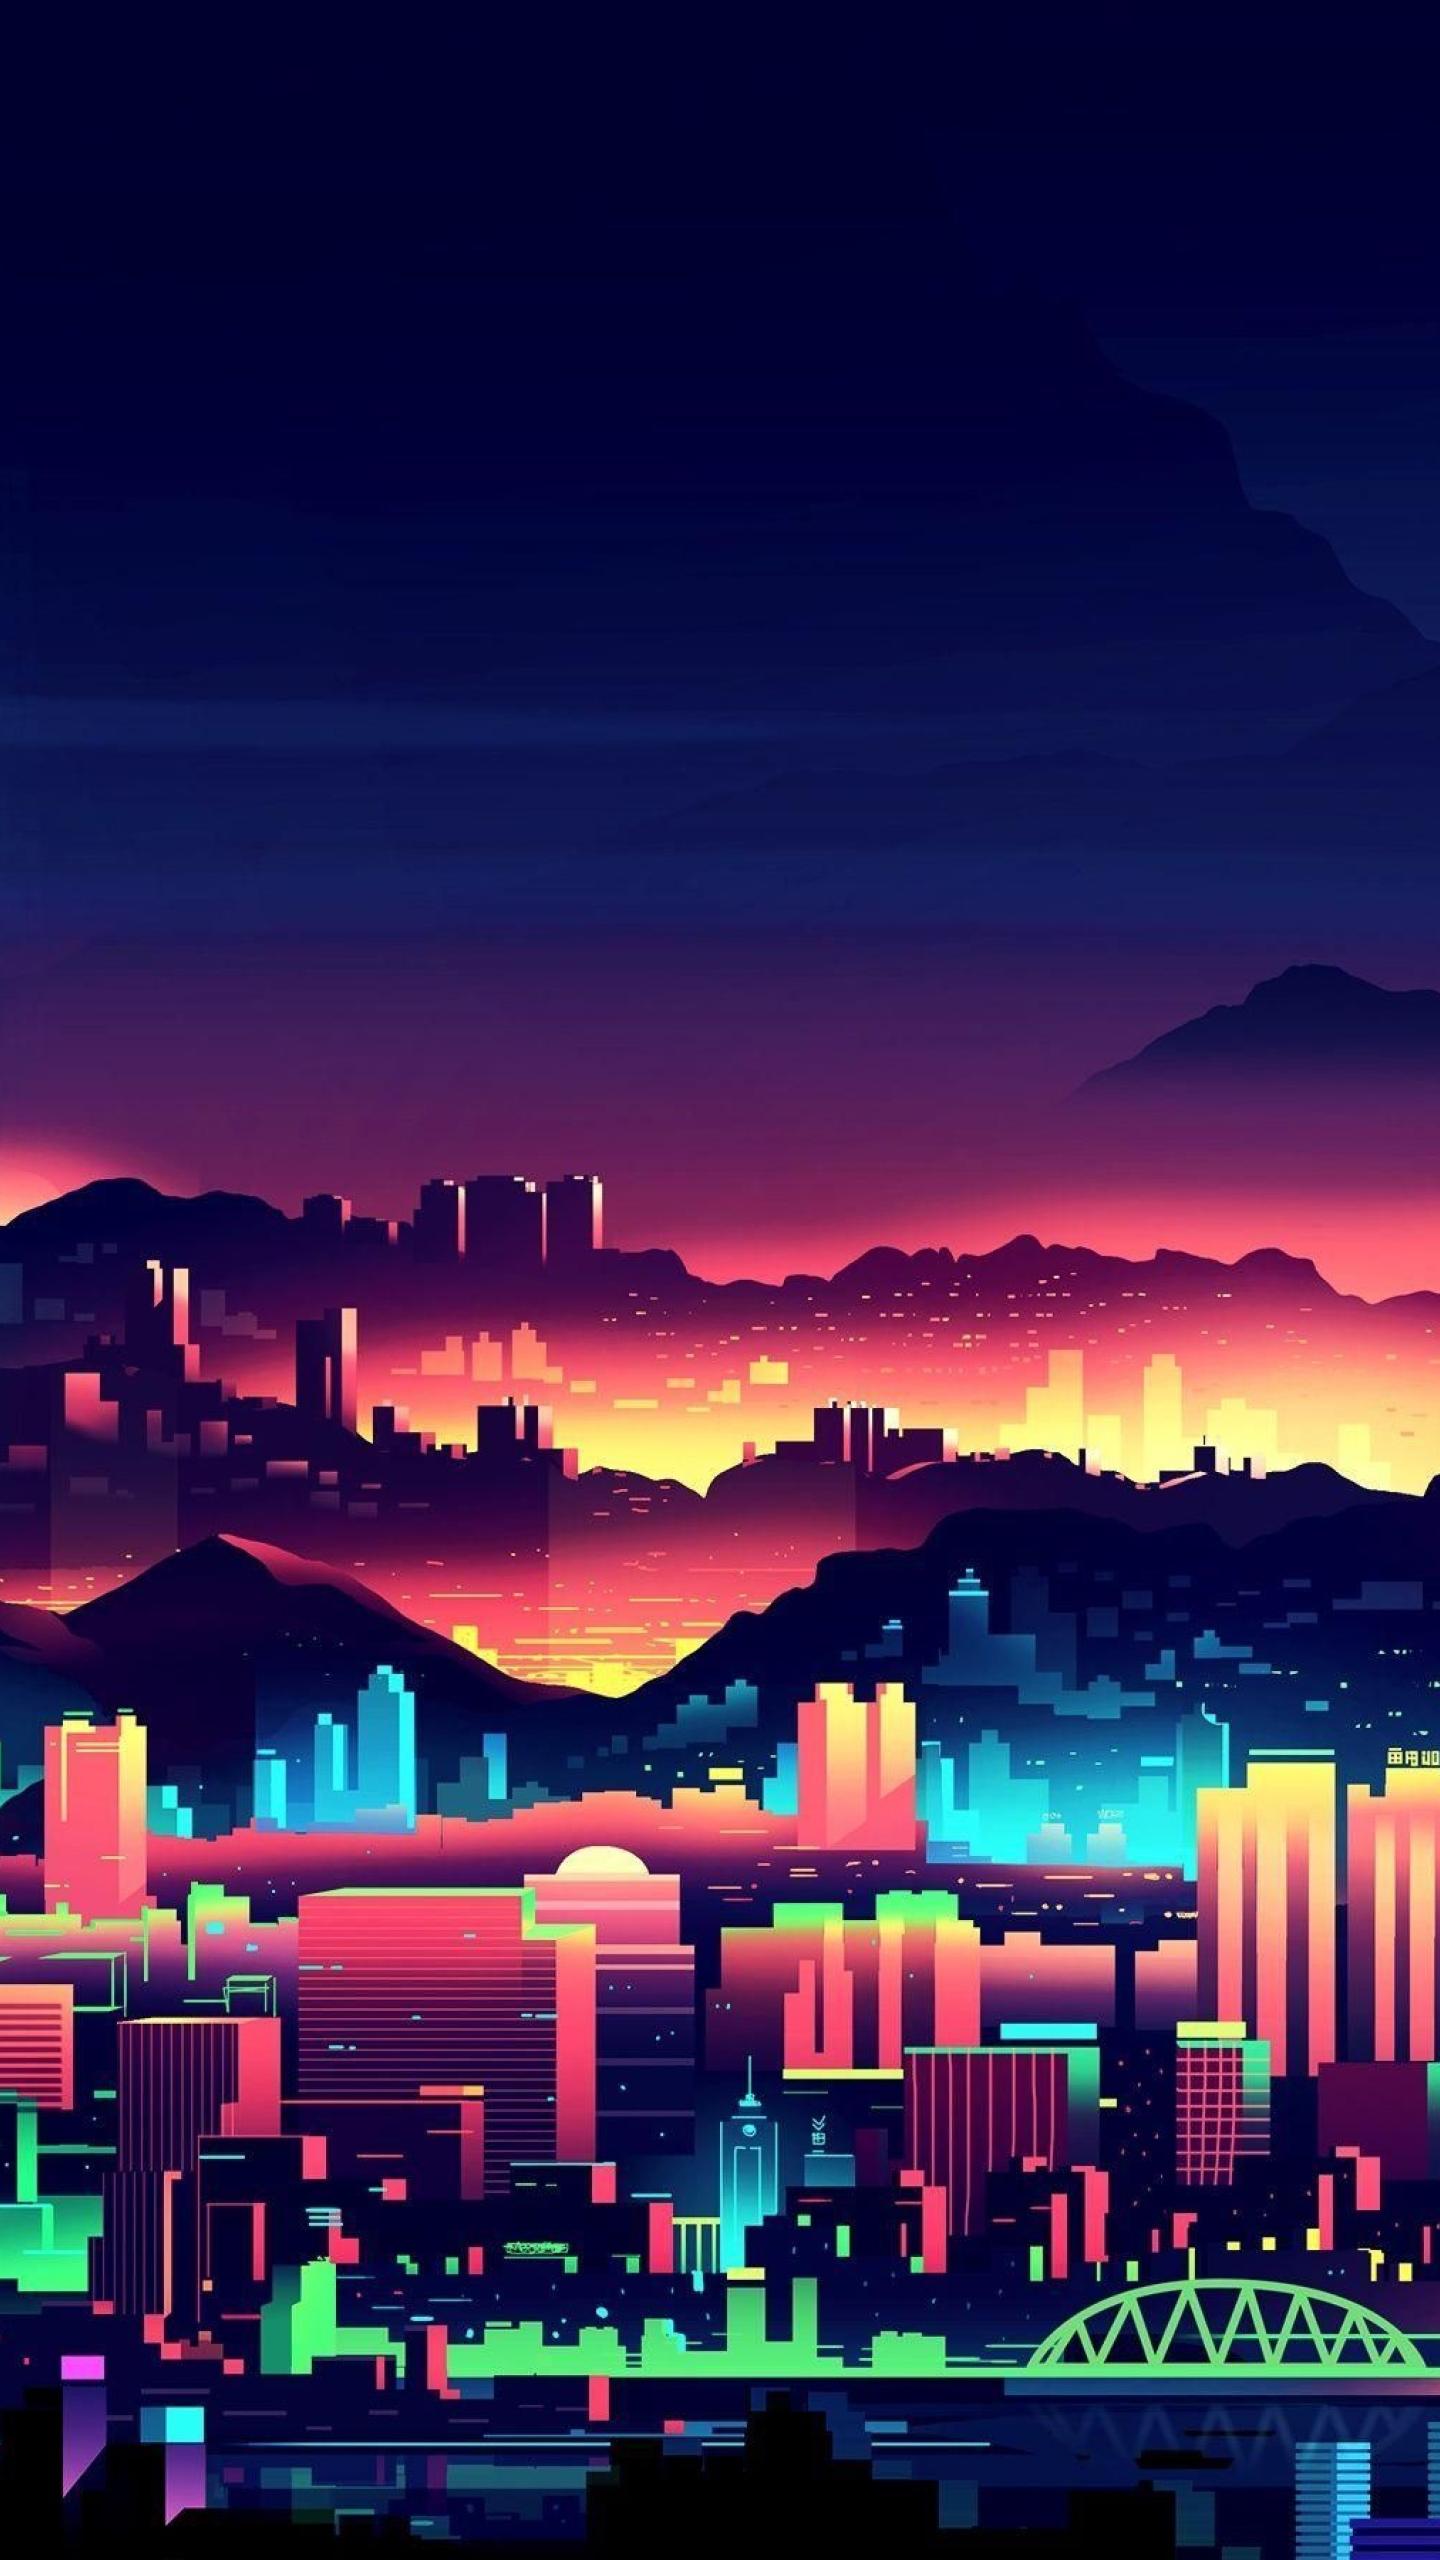 HD Wallpaper | Background Image Retro 80s Digital Minimalism City